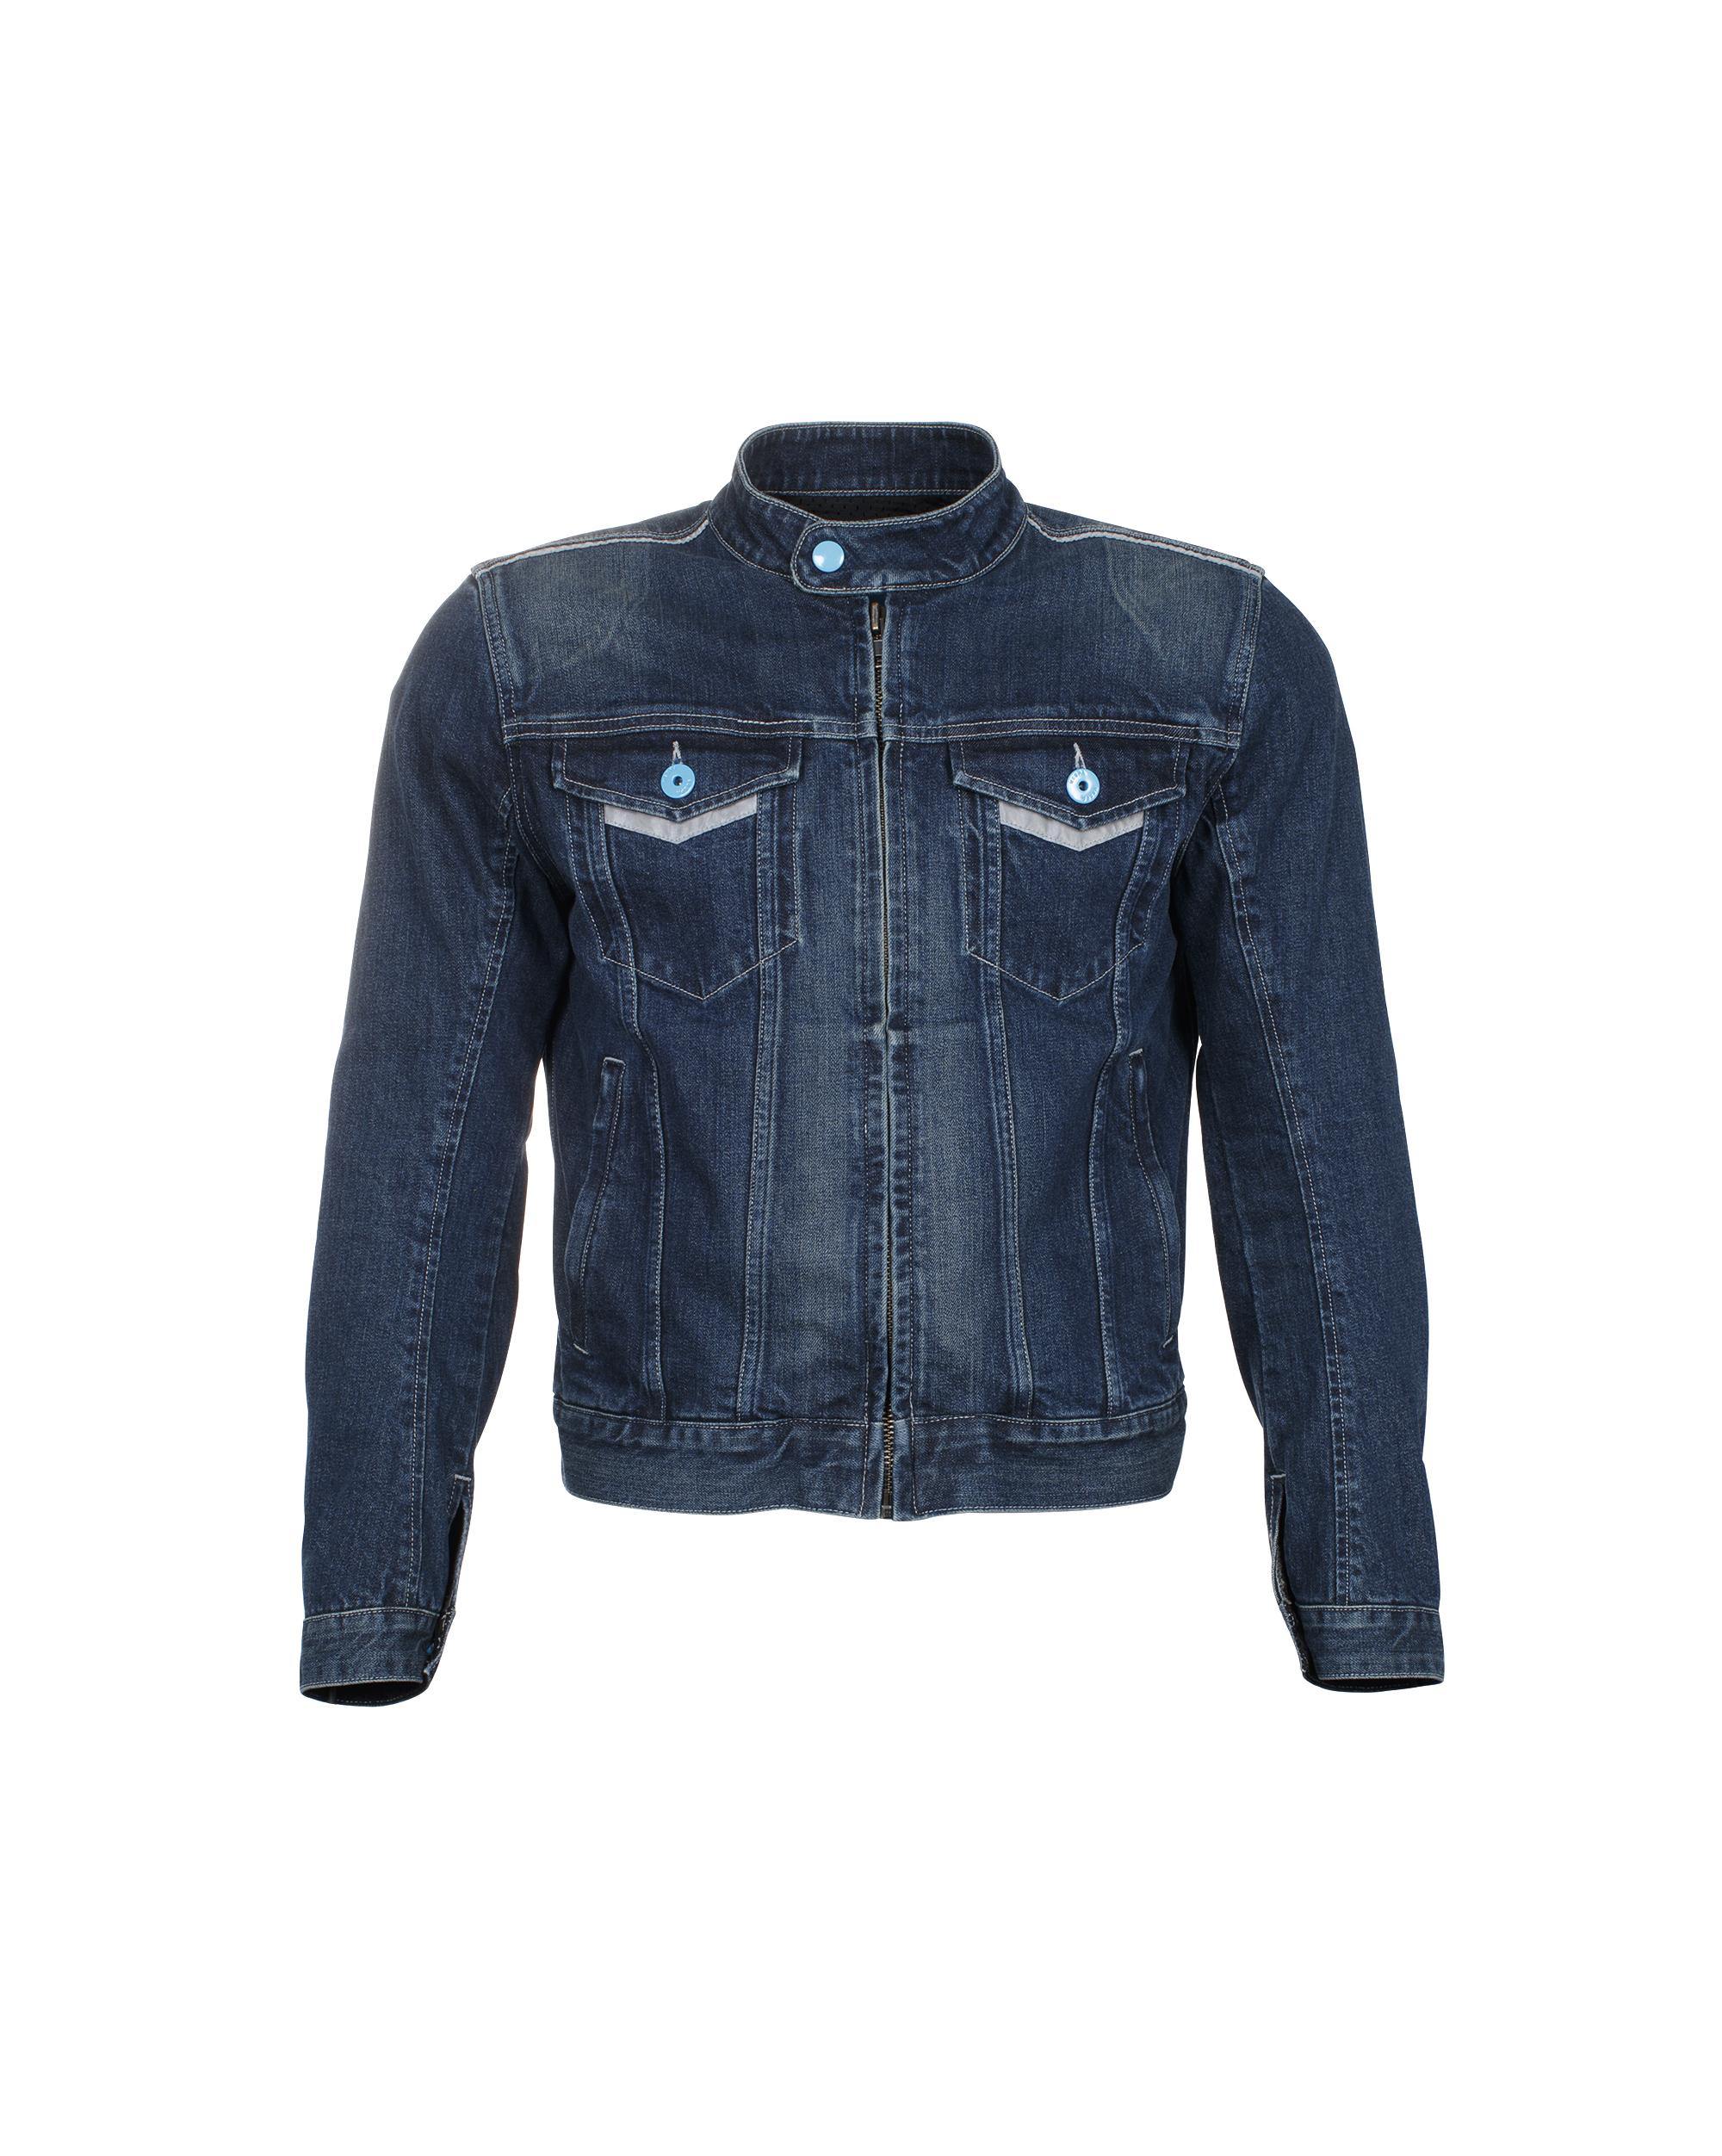 Vespa Jacke Denim Polyester Denim blau